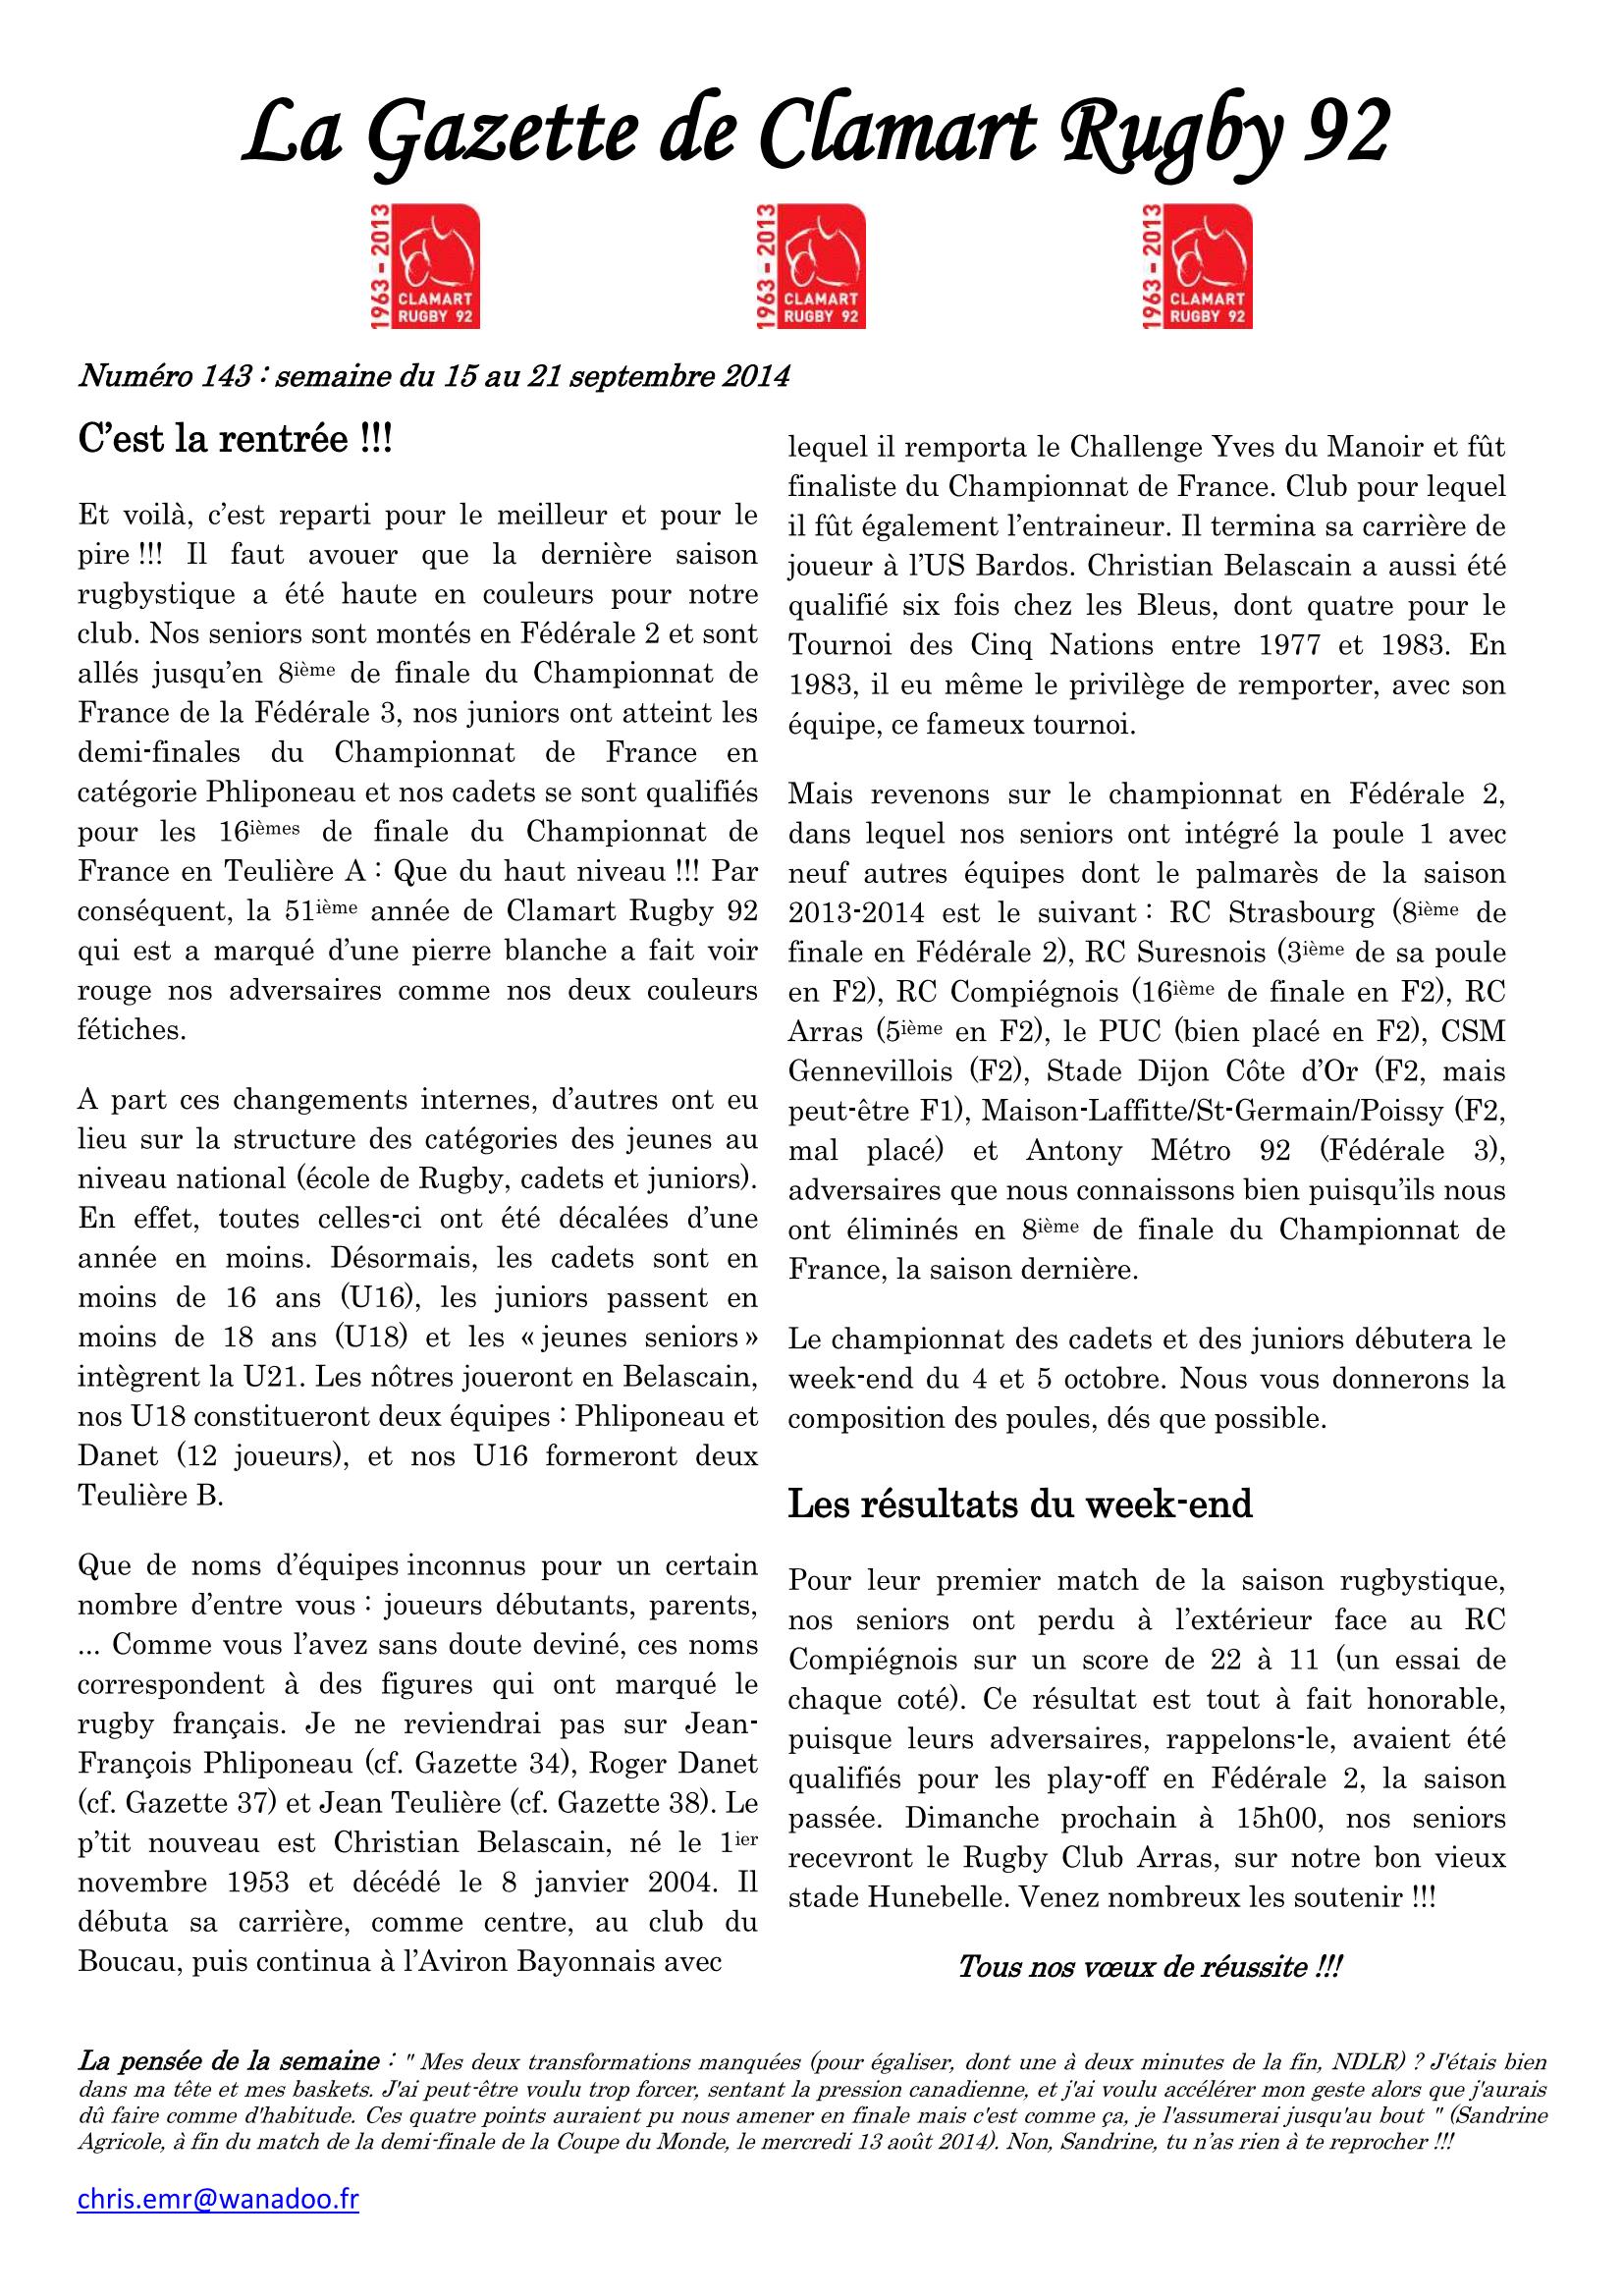 Gazette - 2014-2015 - Fédérale 2 - N° 143